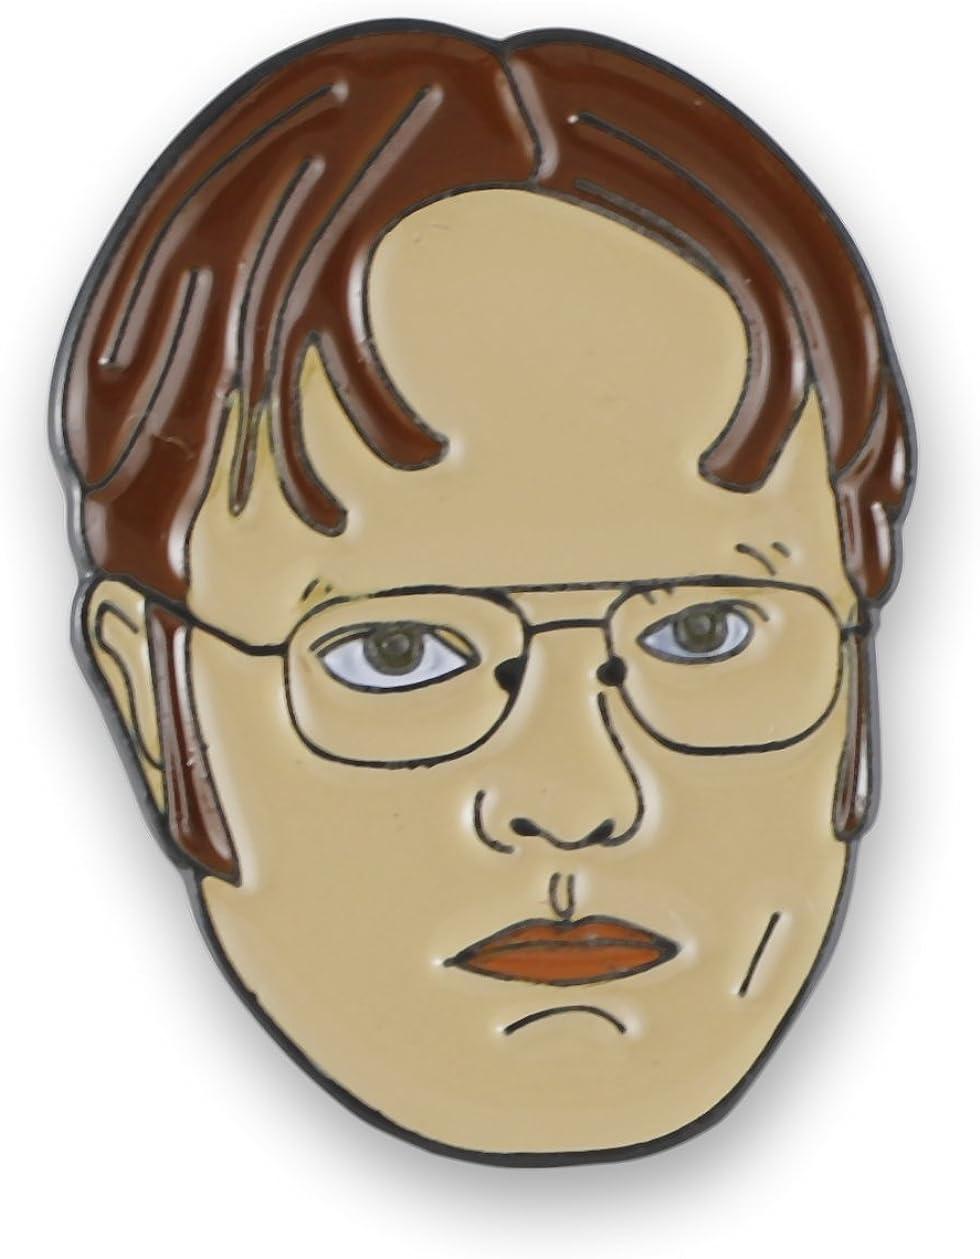 Forge Dwight Schrute Rainn Wilson Enamel Lapel Pin (1 Pin)